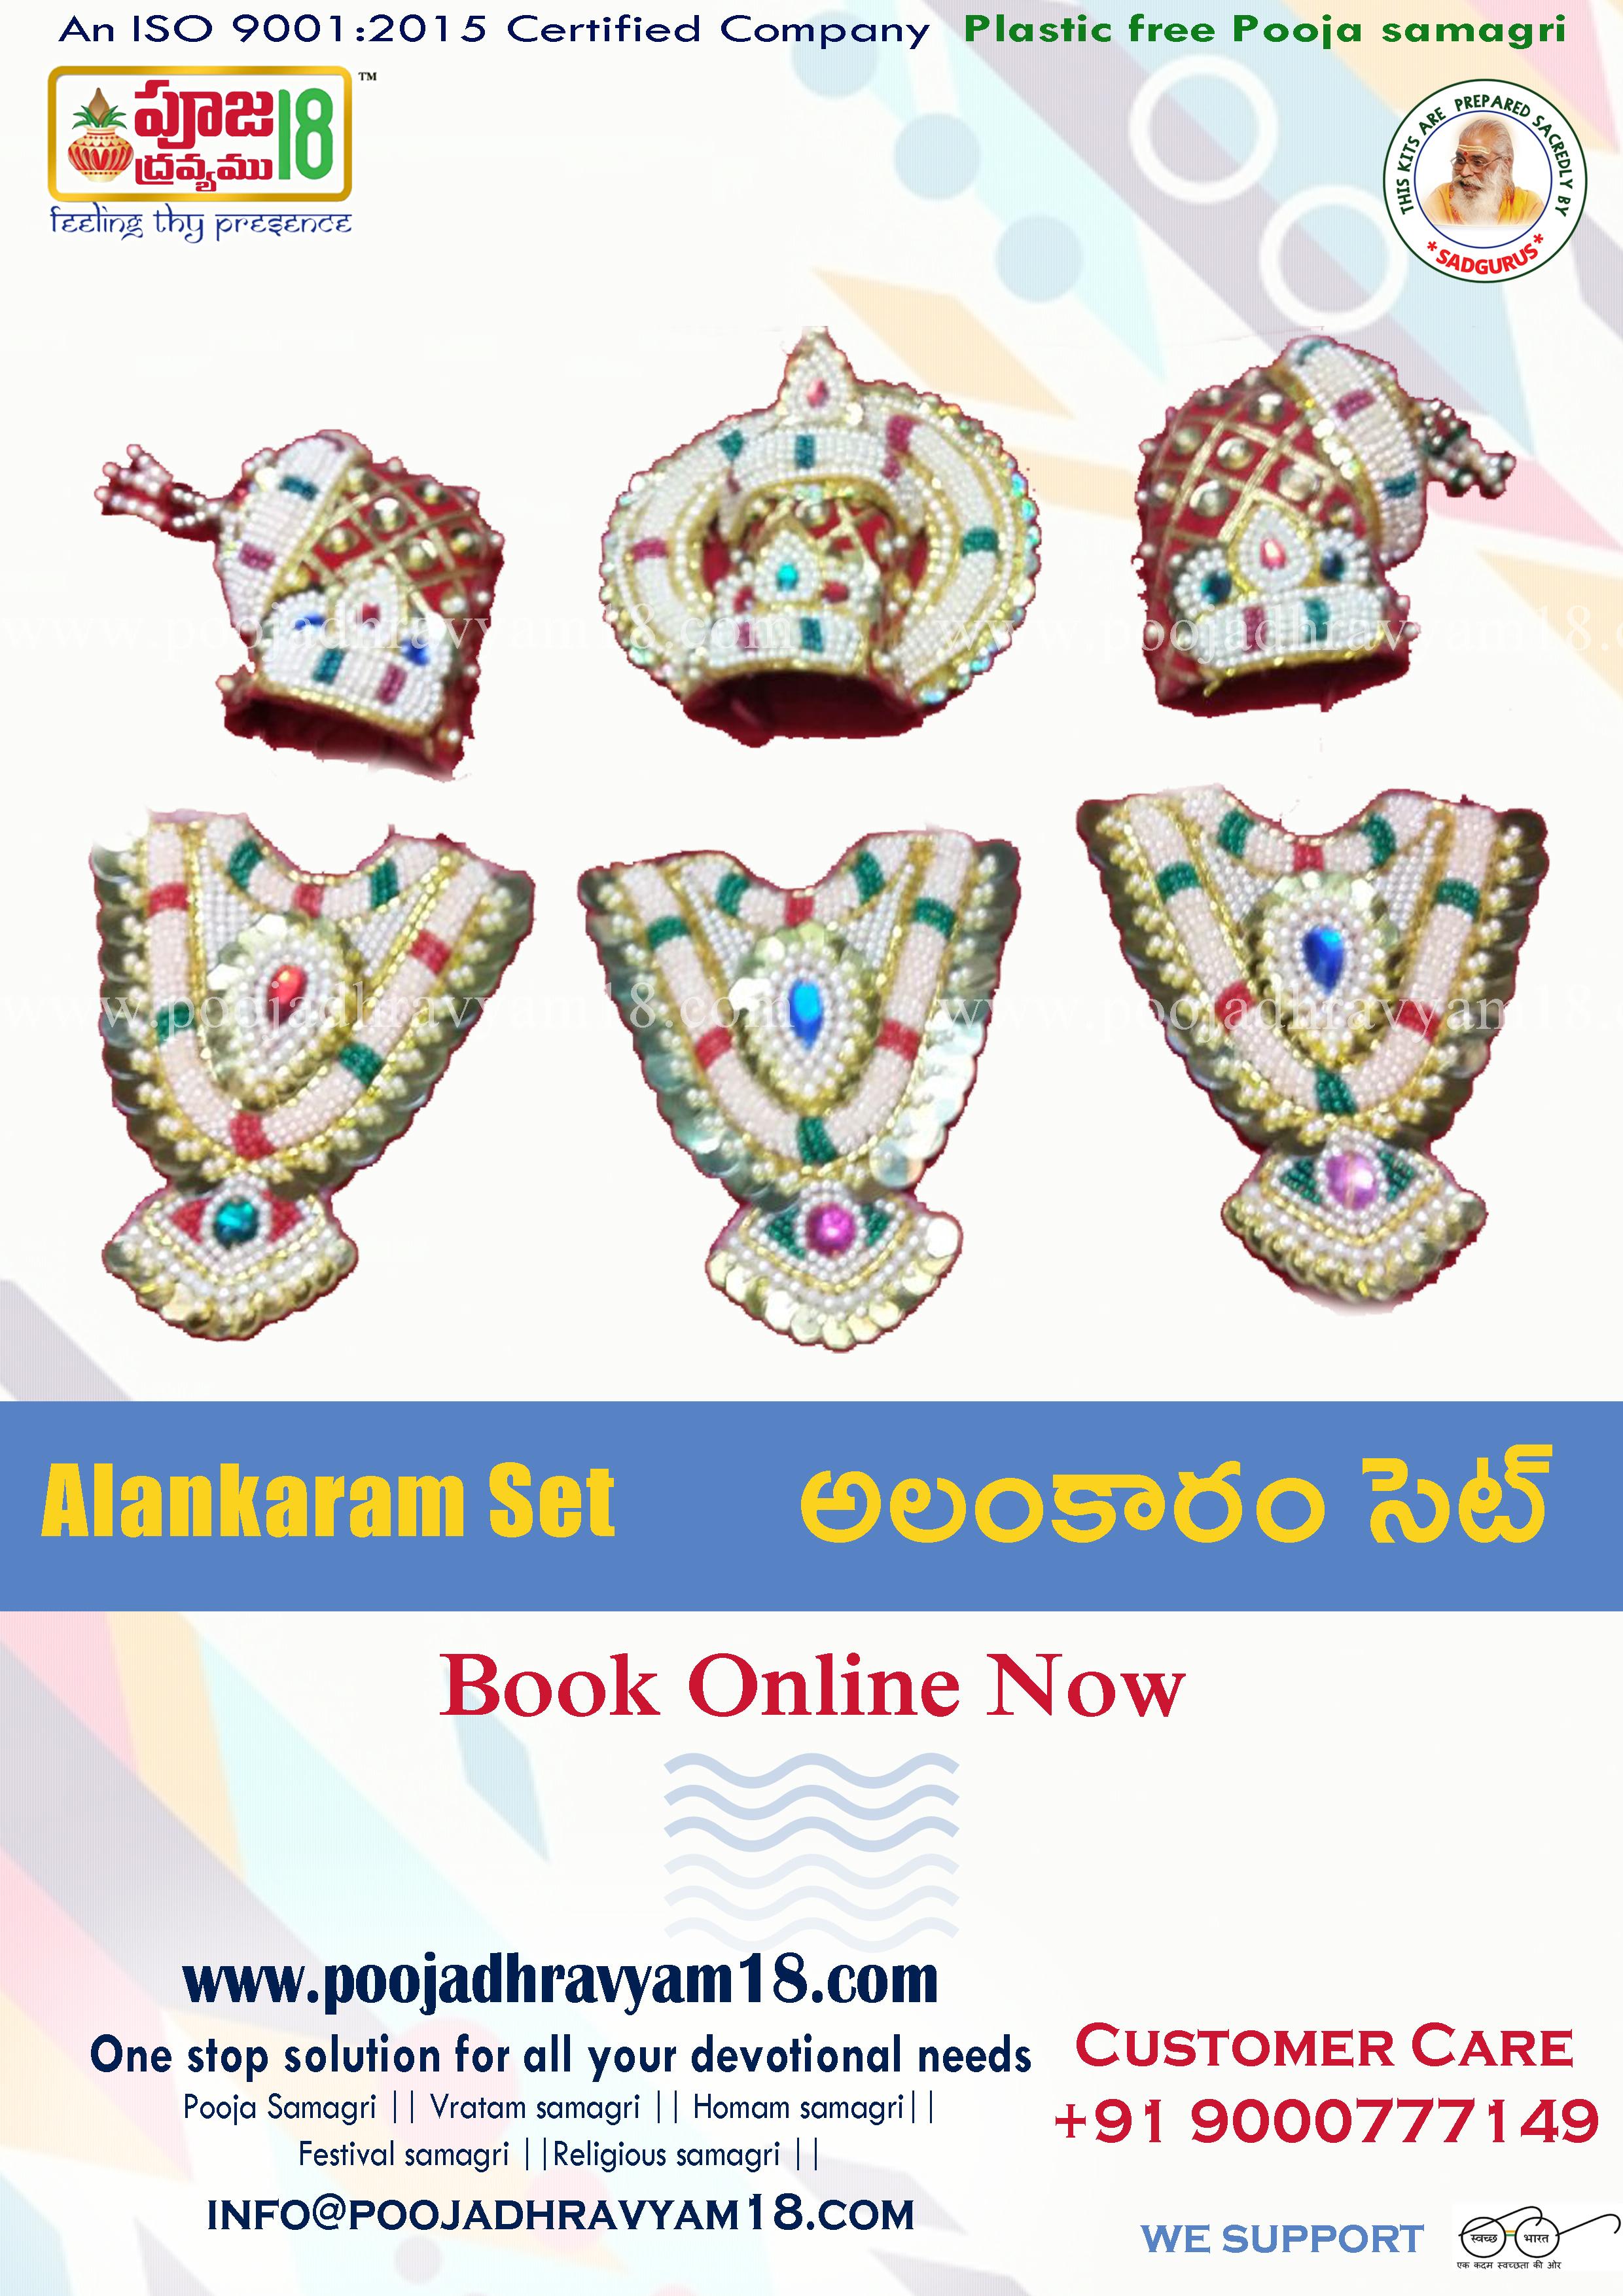 alankaram ornament eco friendly